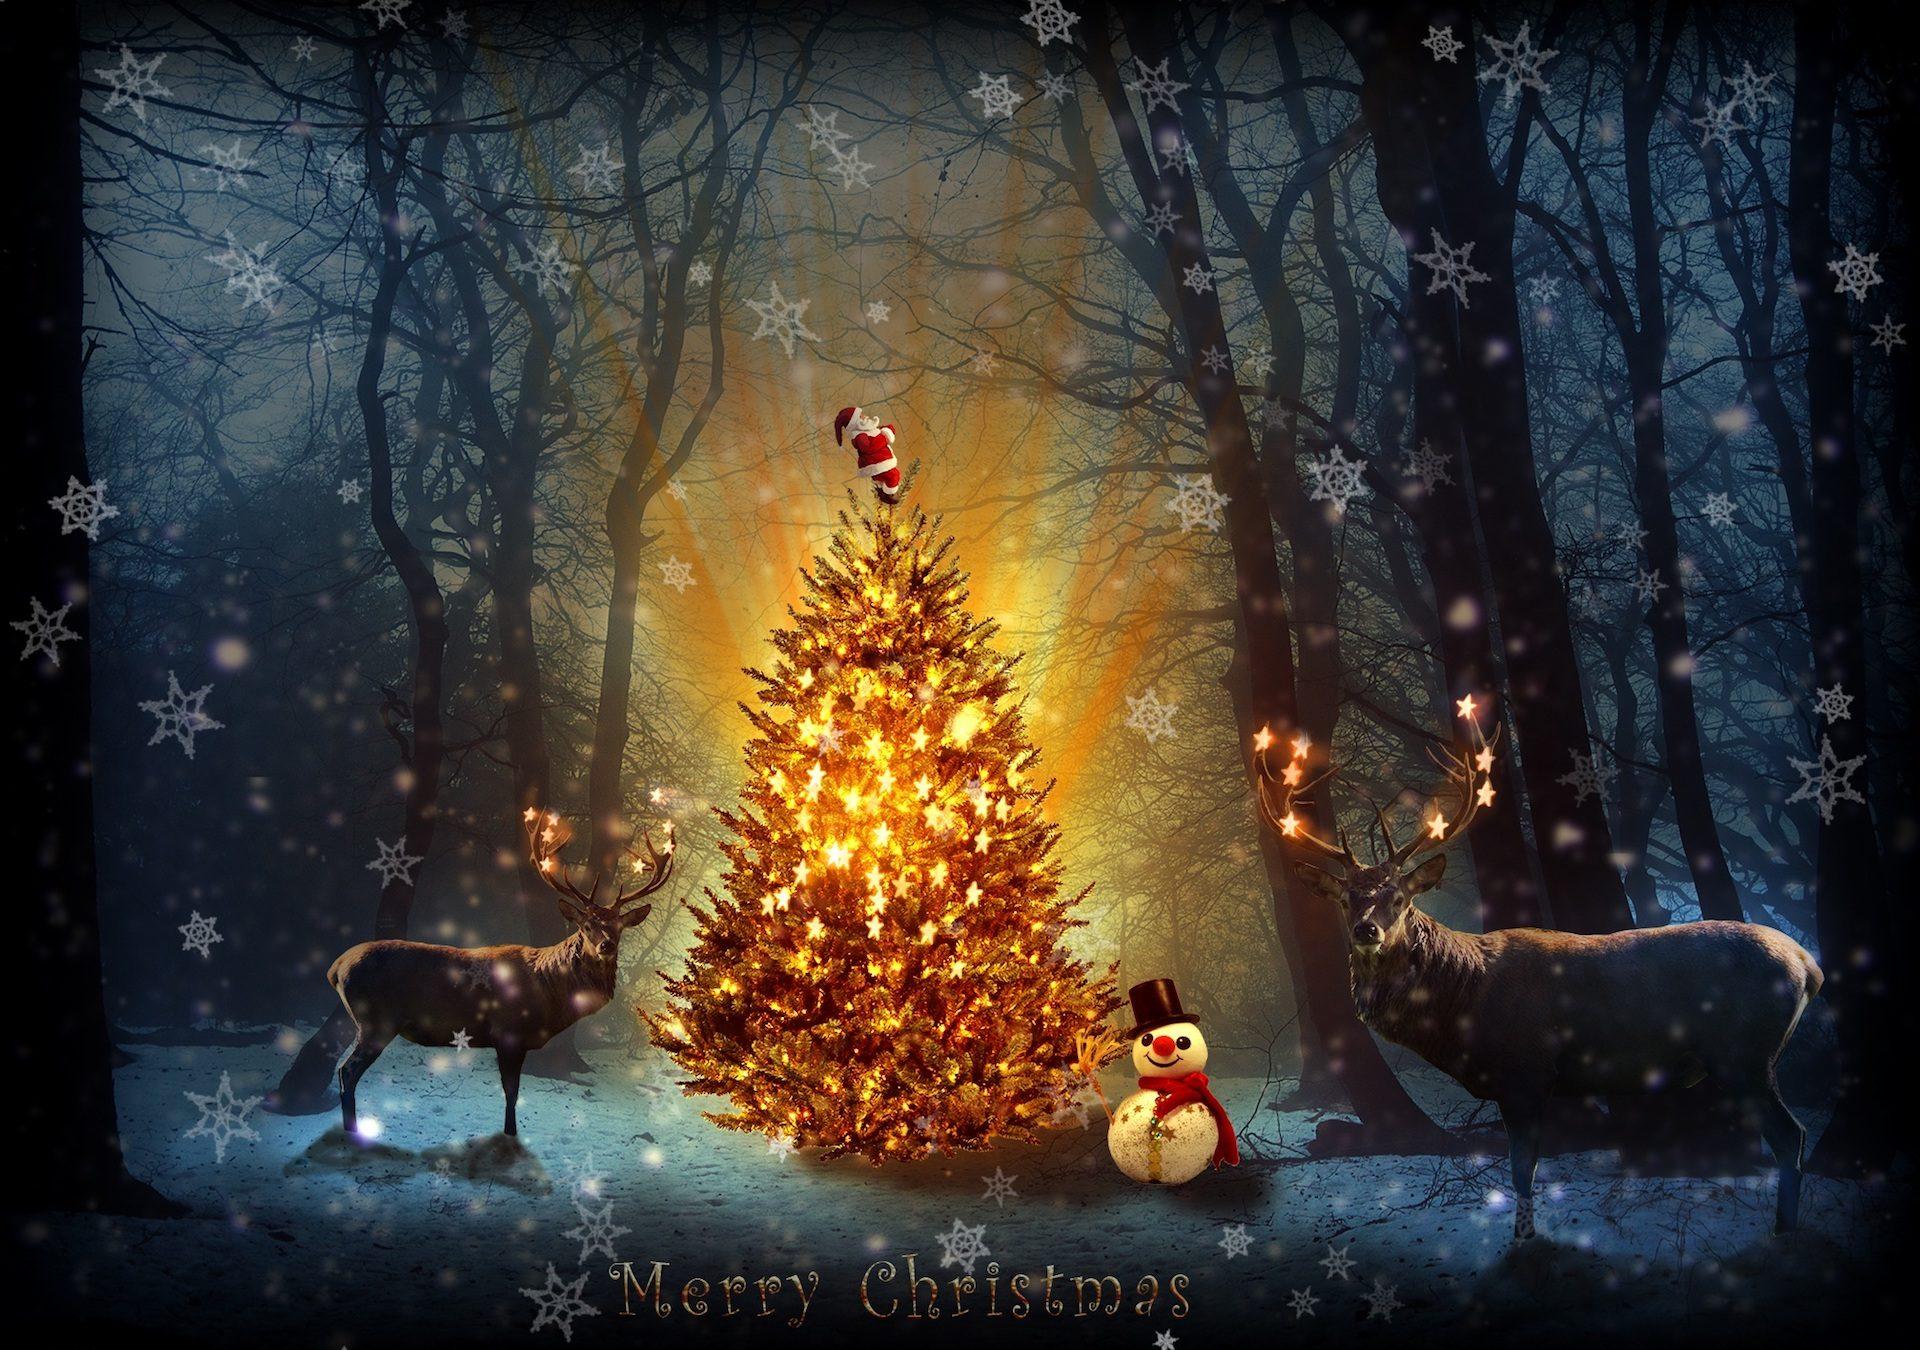 árbol, Cervi, pupazzo di neve, foresta, saluto, carta, Natale - Sfondi HD - Professor-falken.com